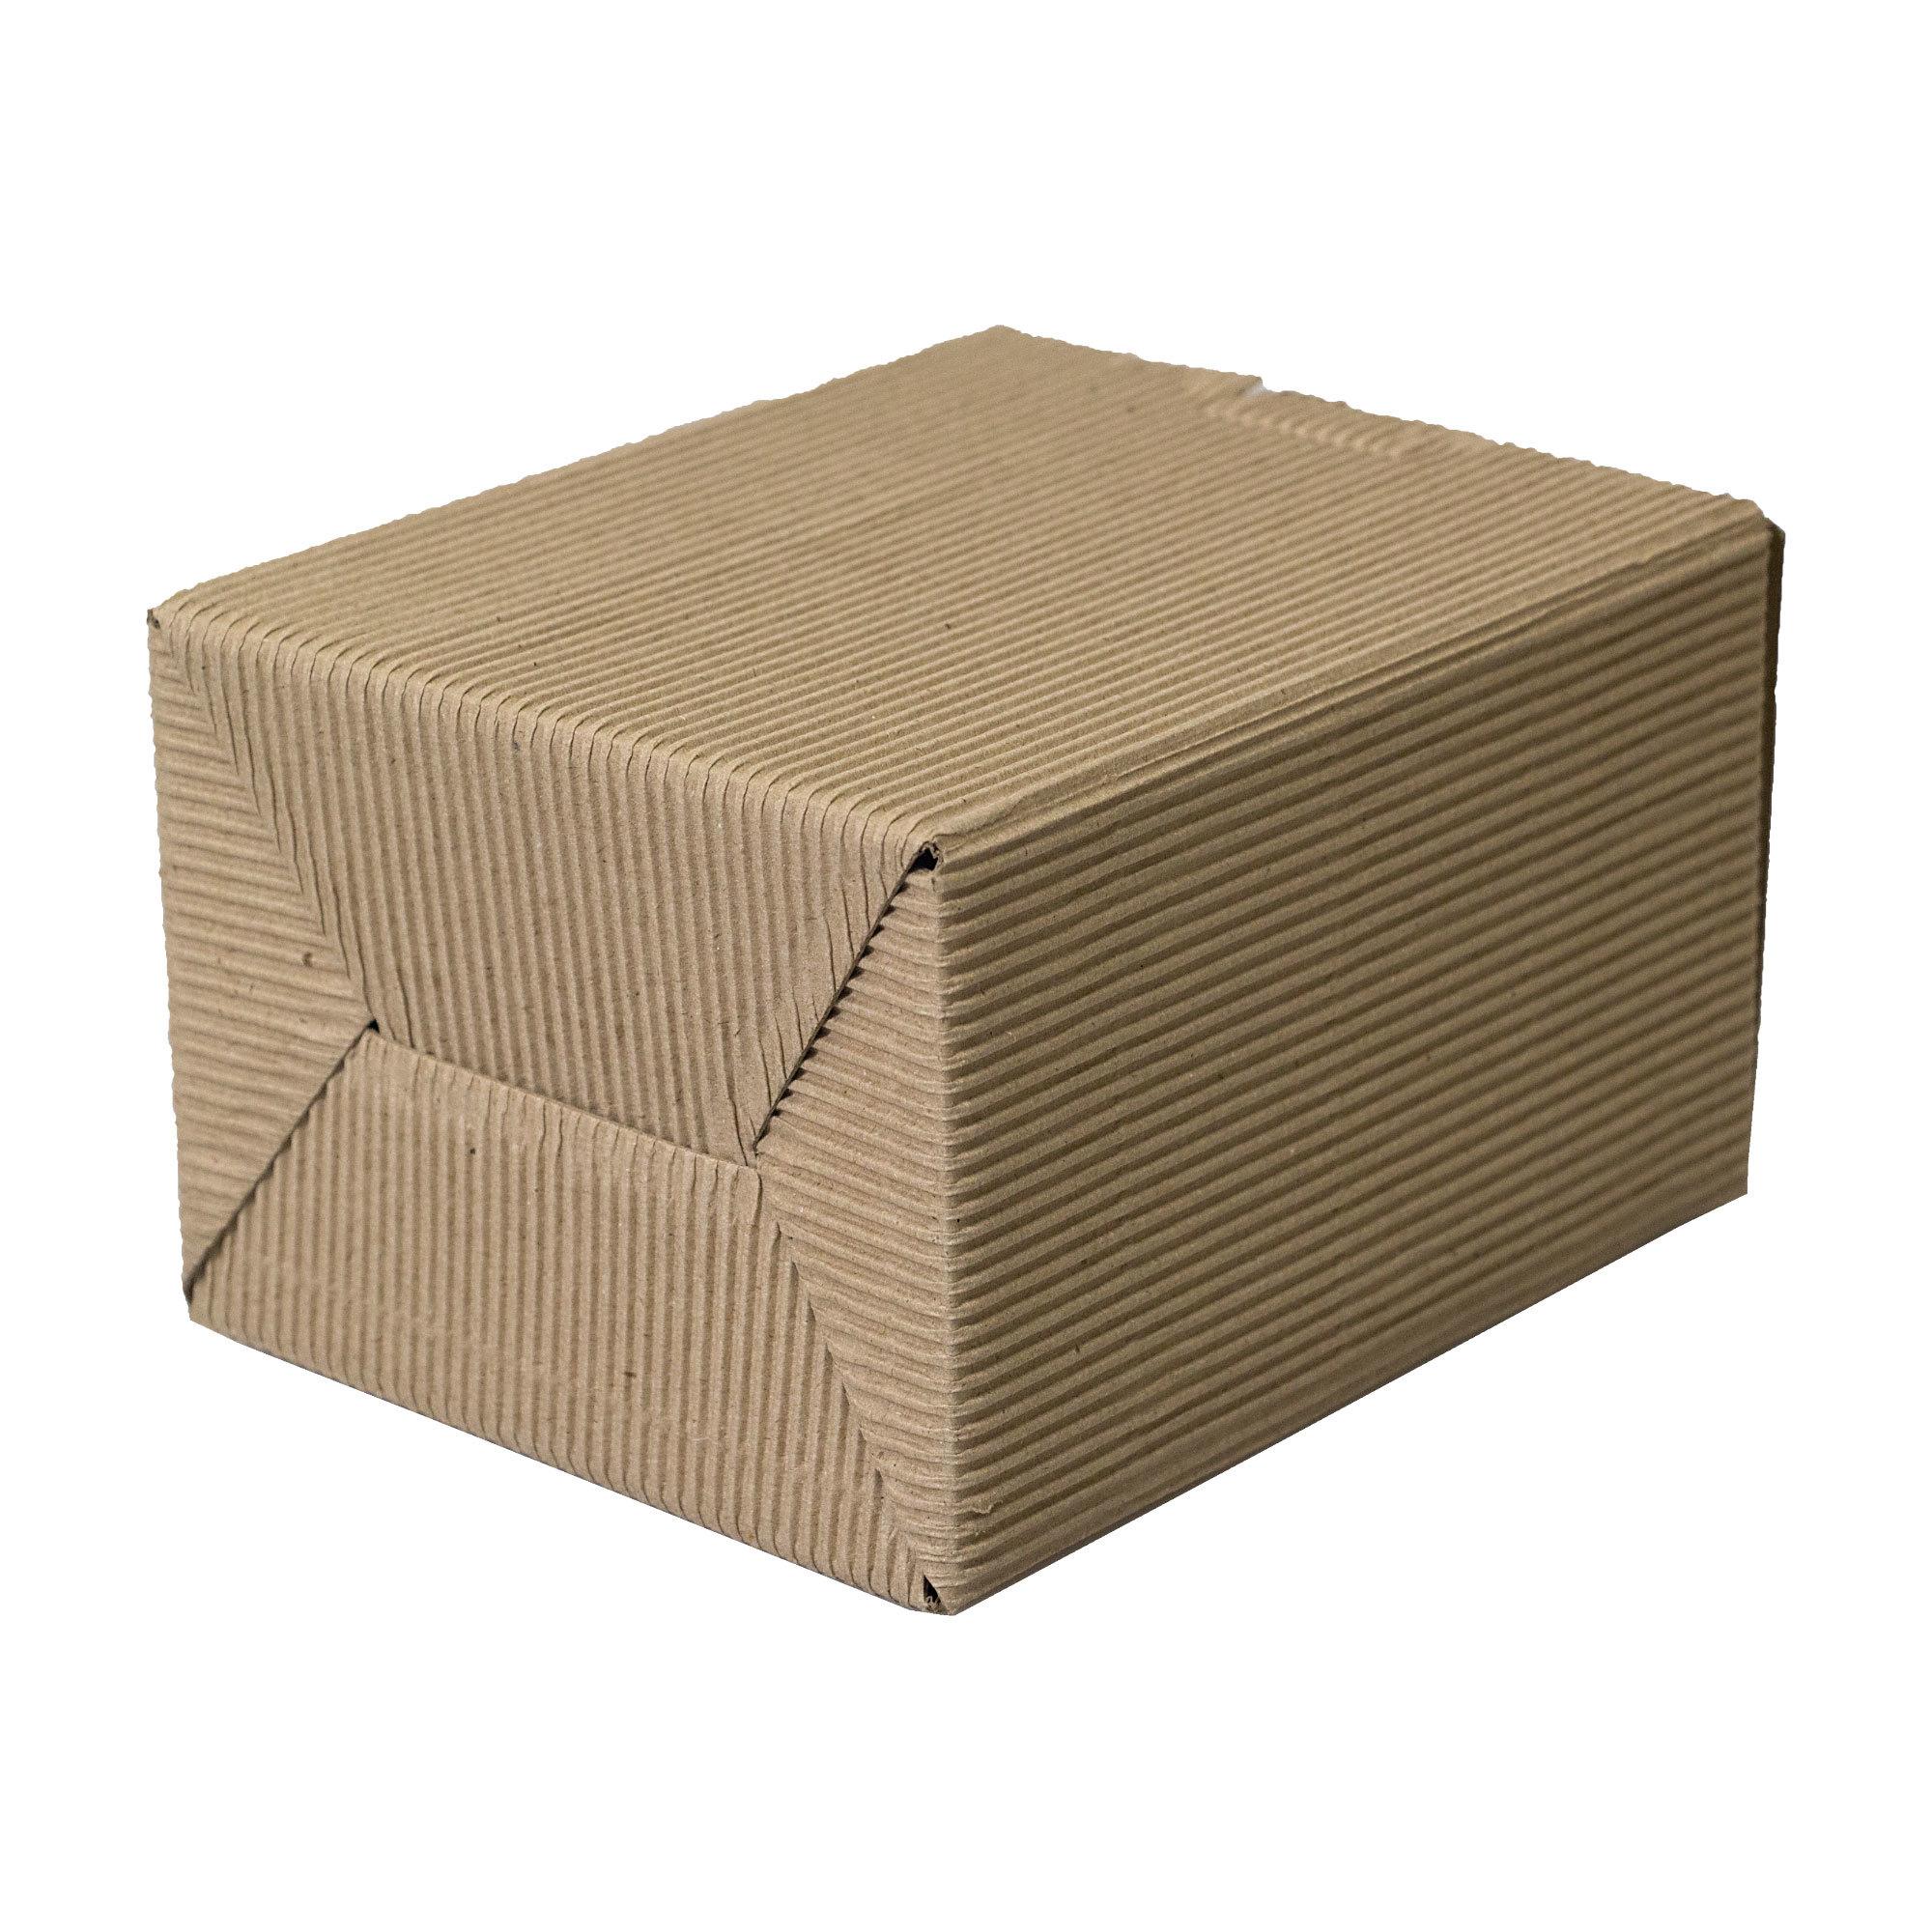 Стандартная упаковка